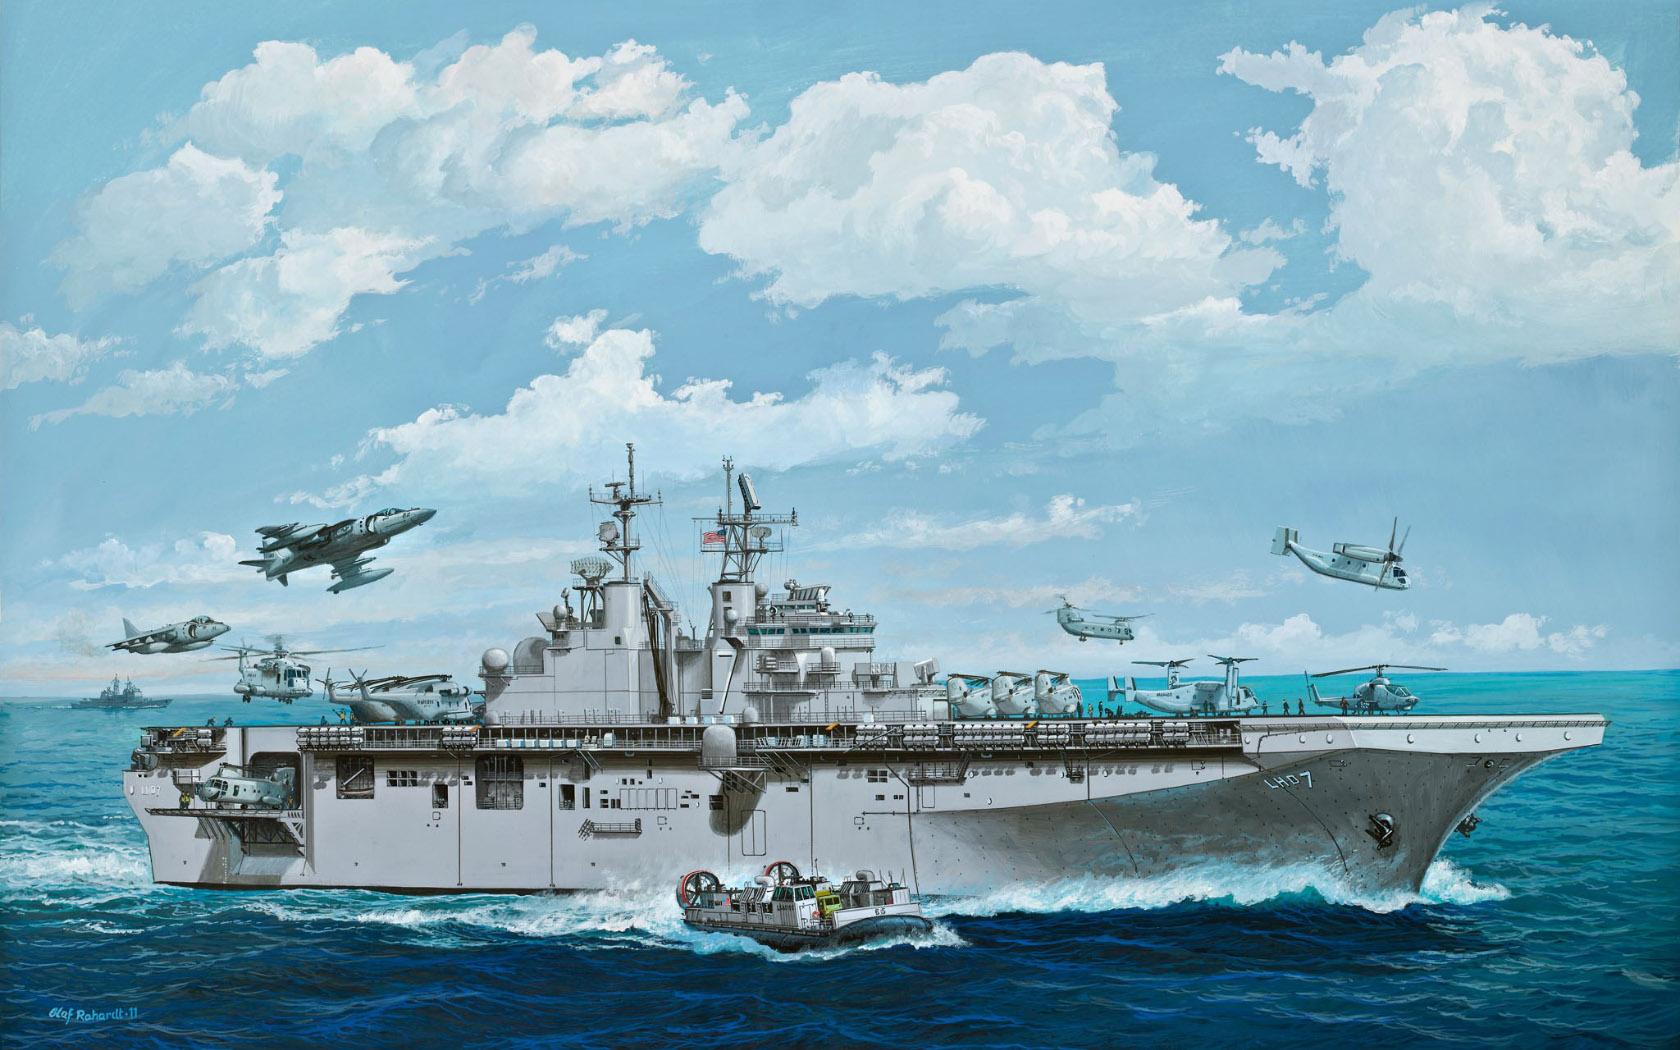 рисунок USS Iwo Jima (LHD-7)